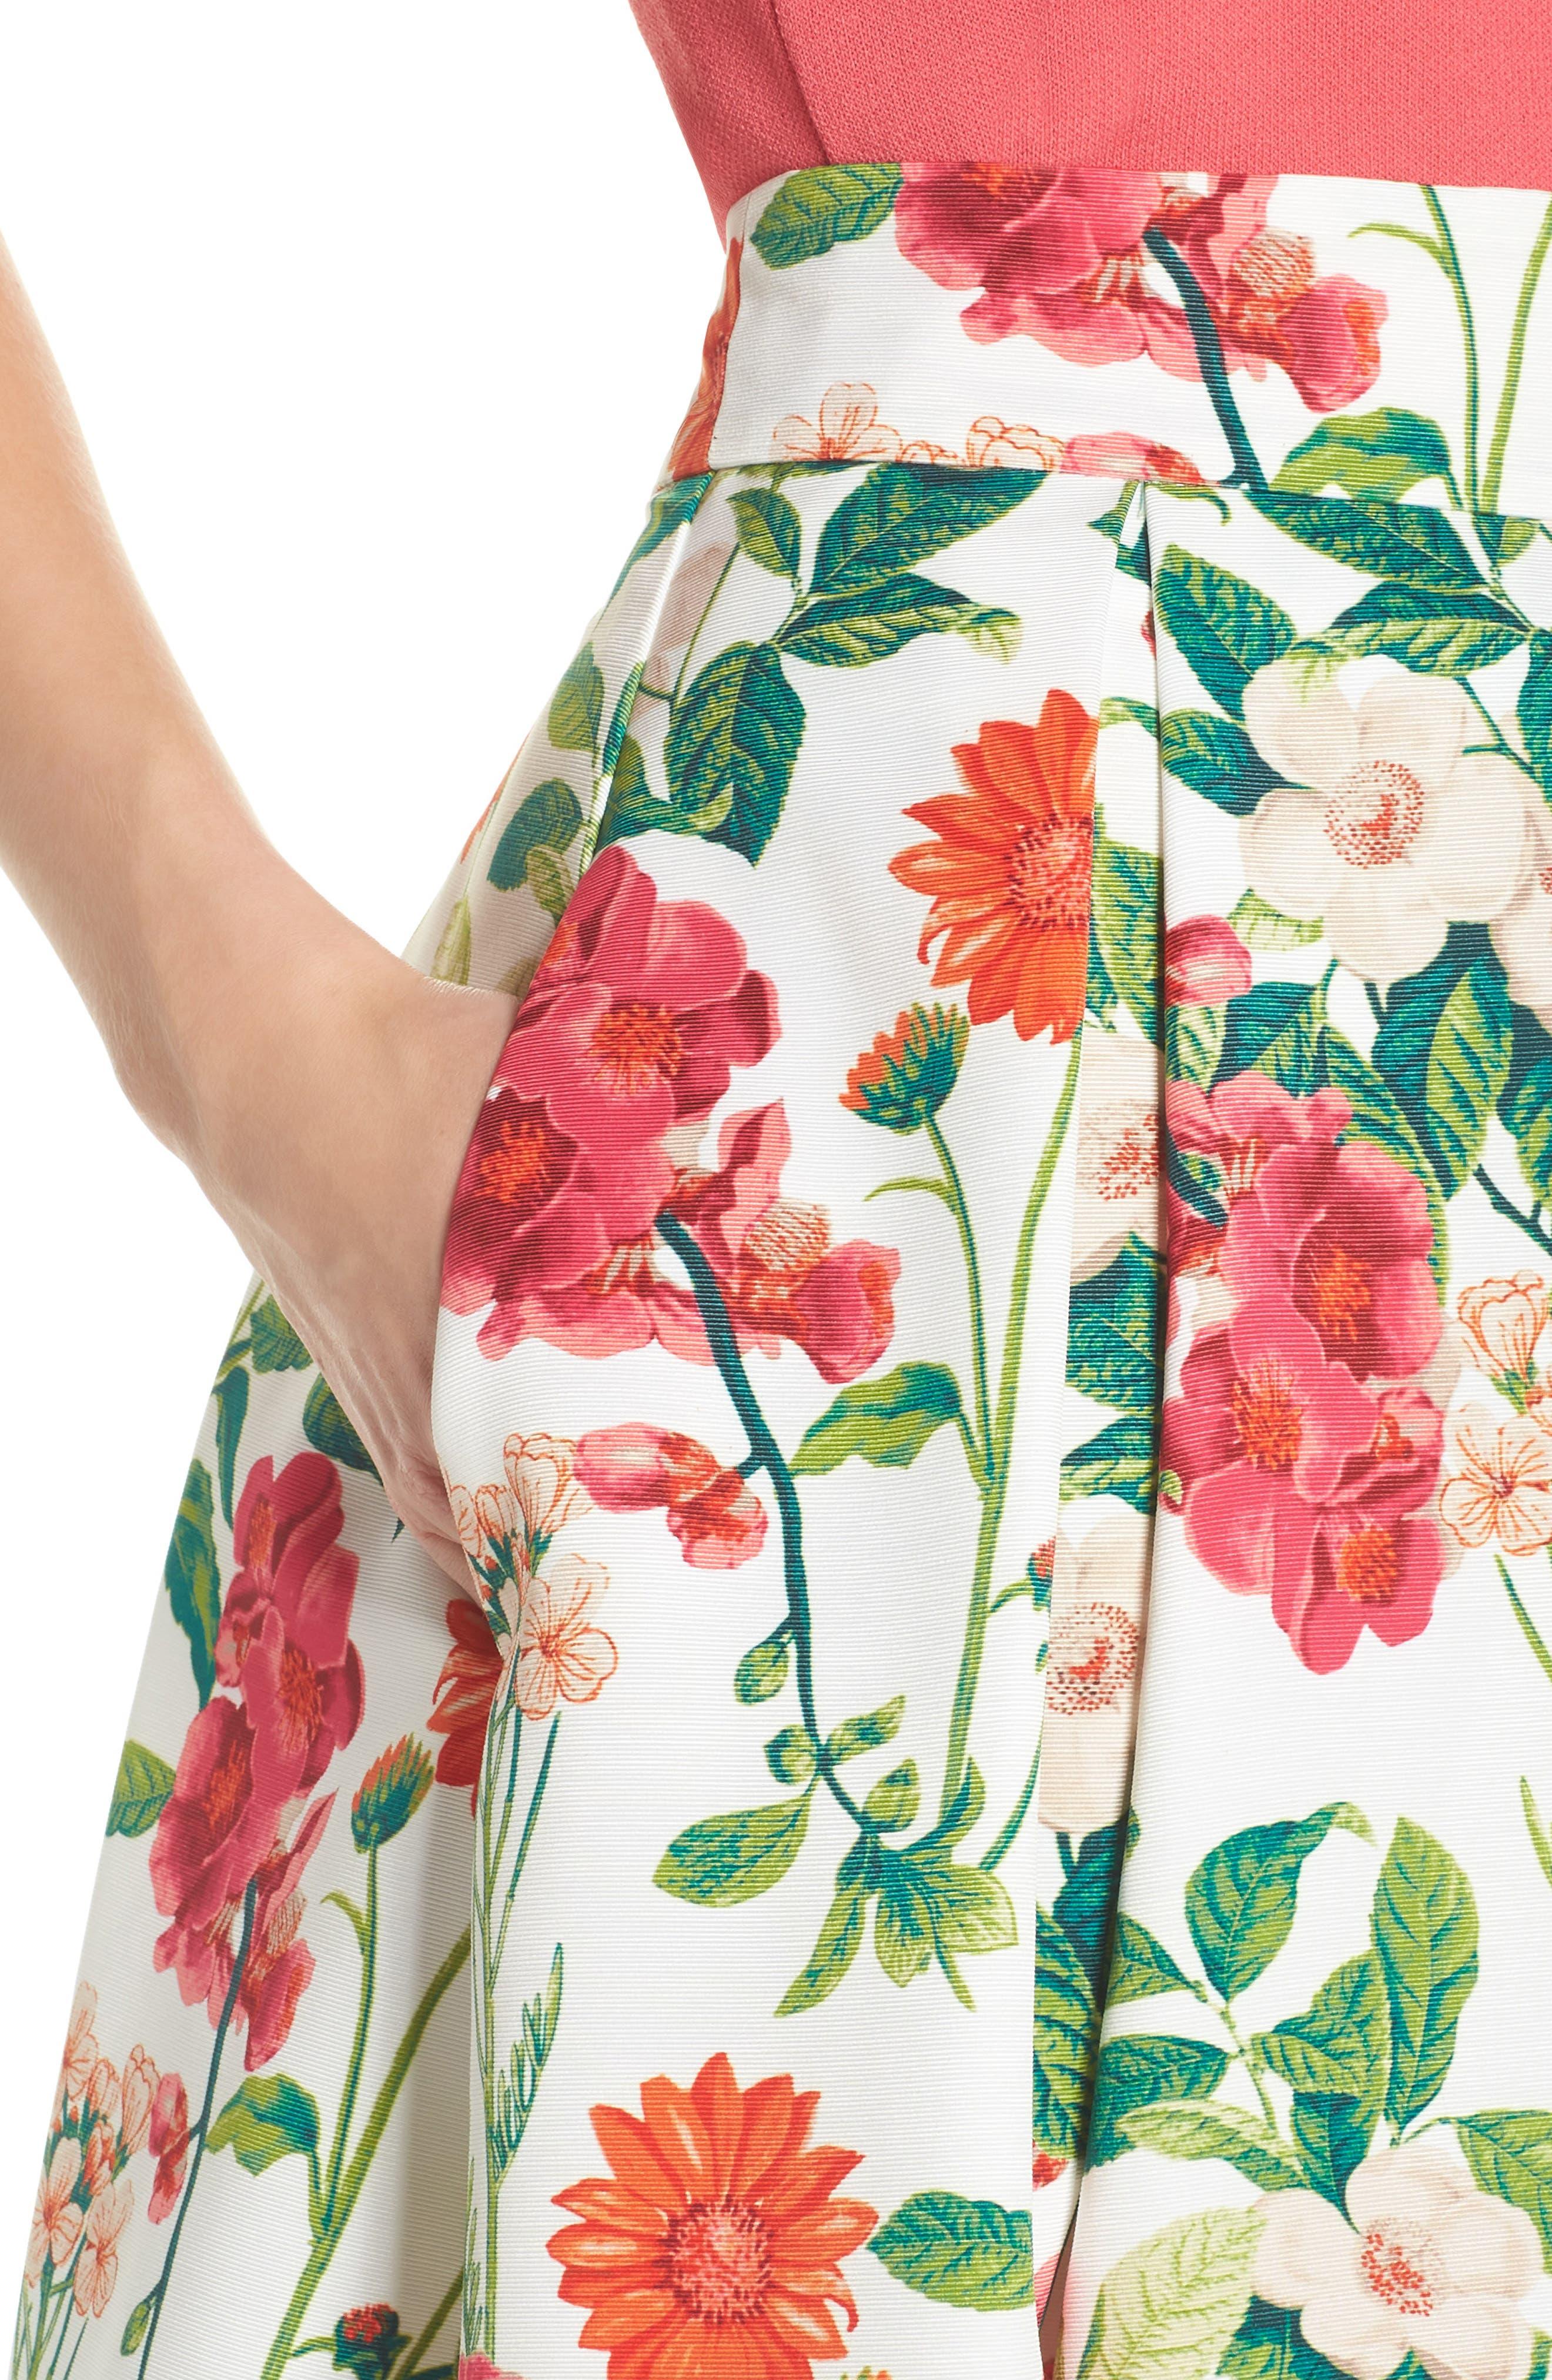 Floral A-Line Skirt,                             Alternate thumbnail 4, color,                             901